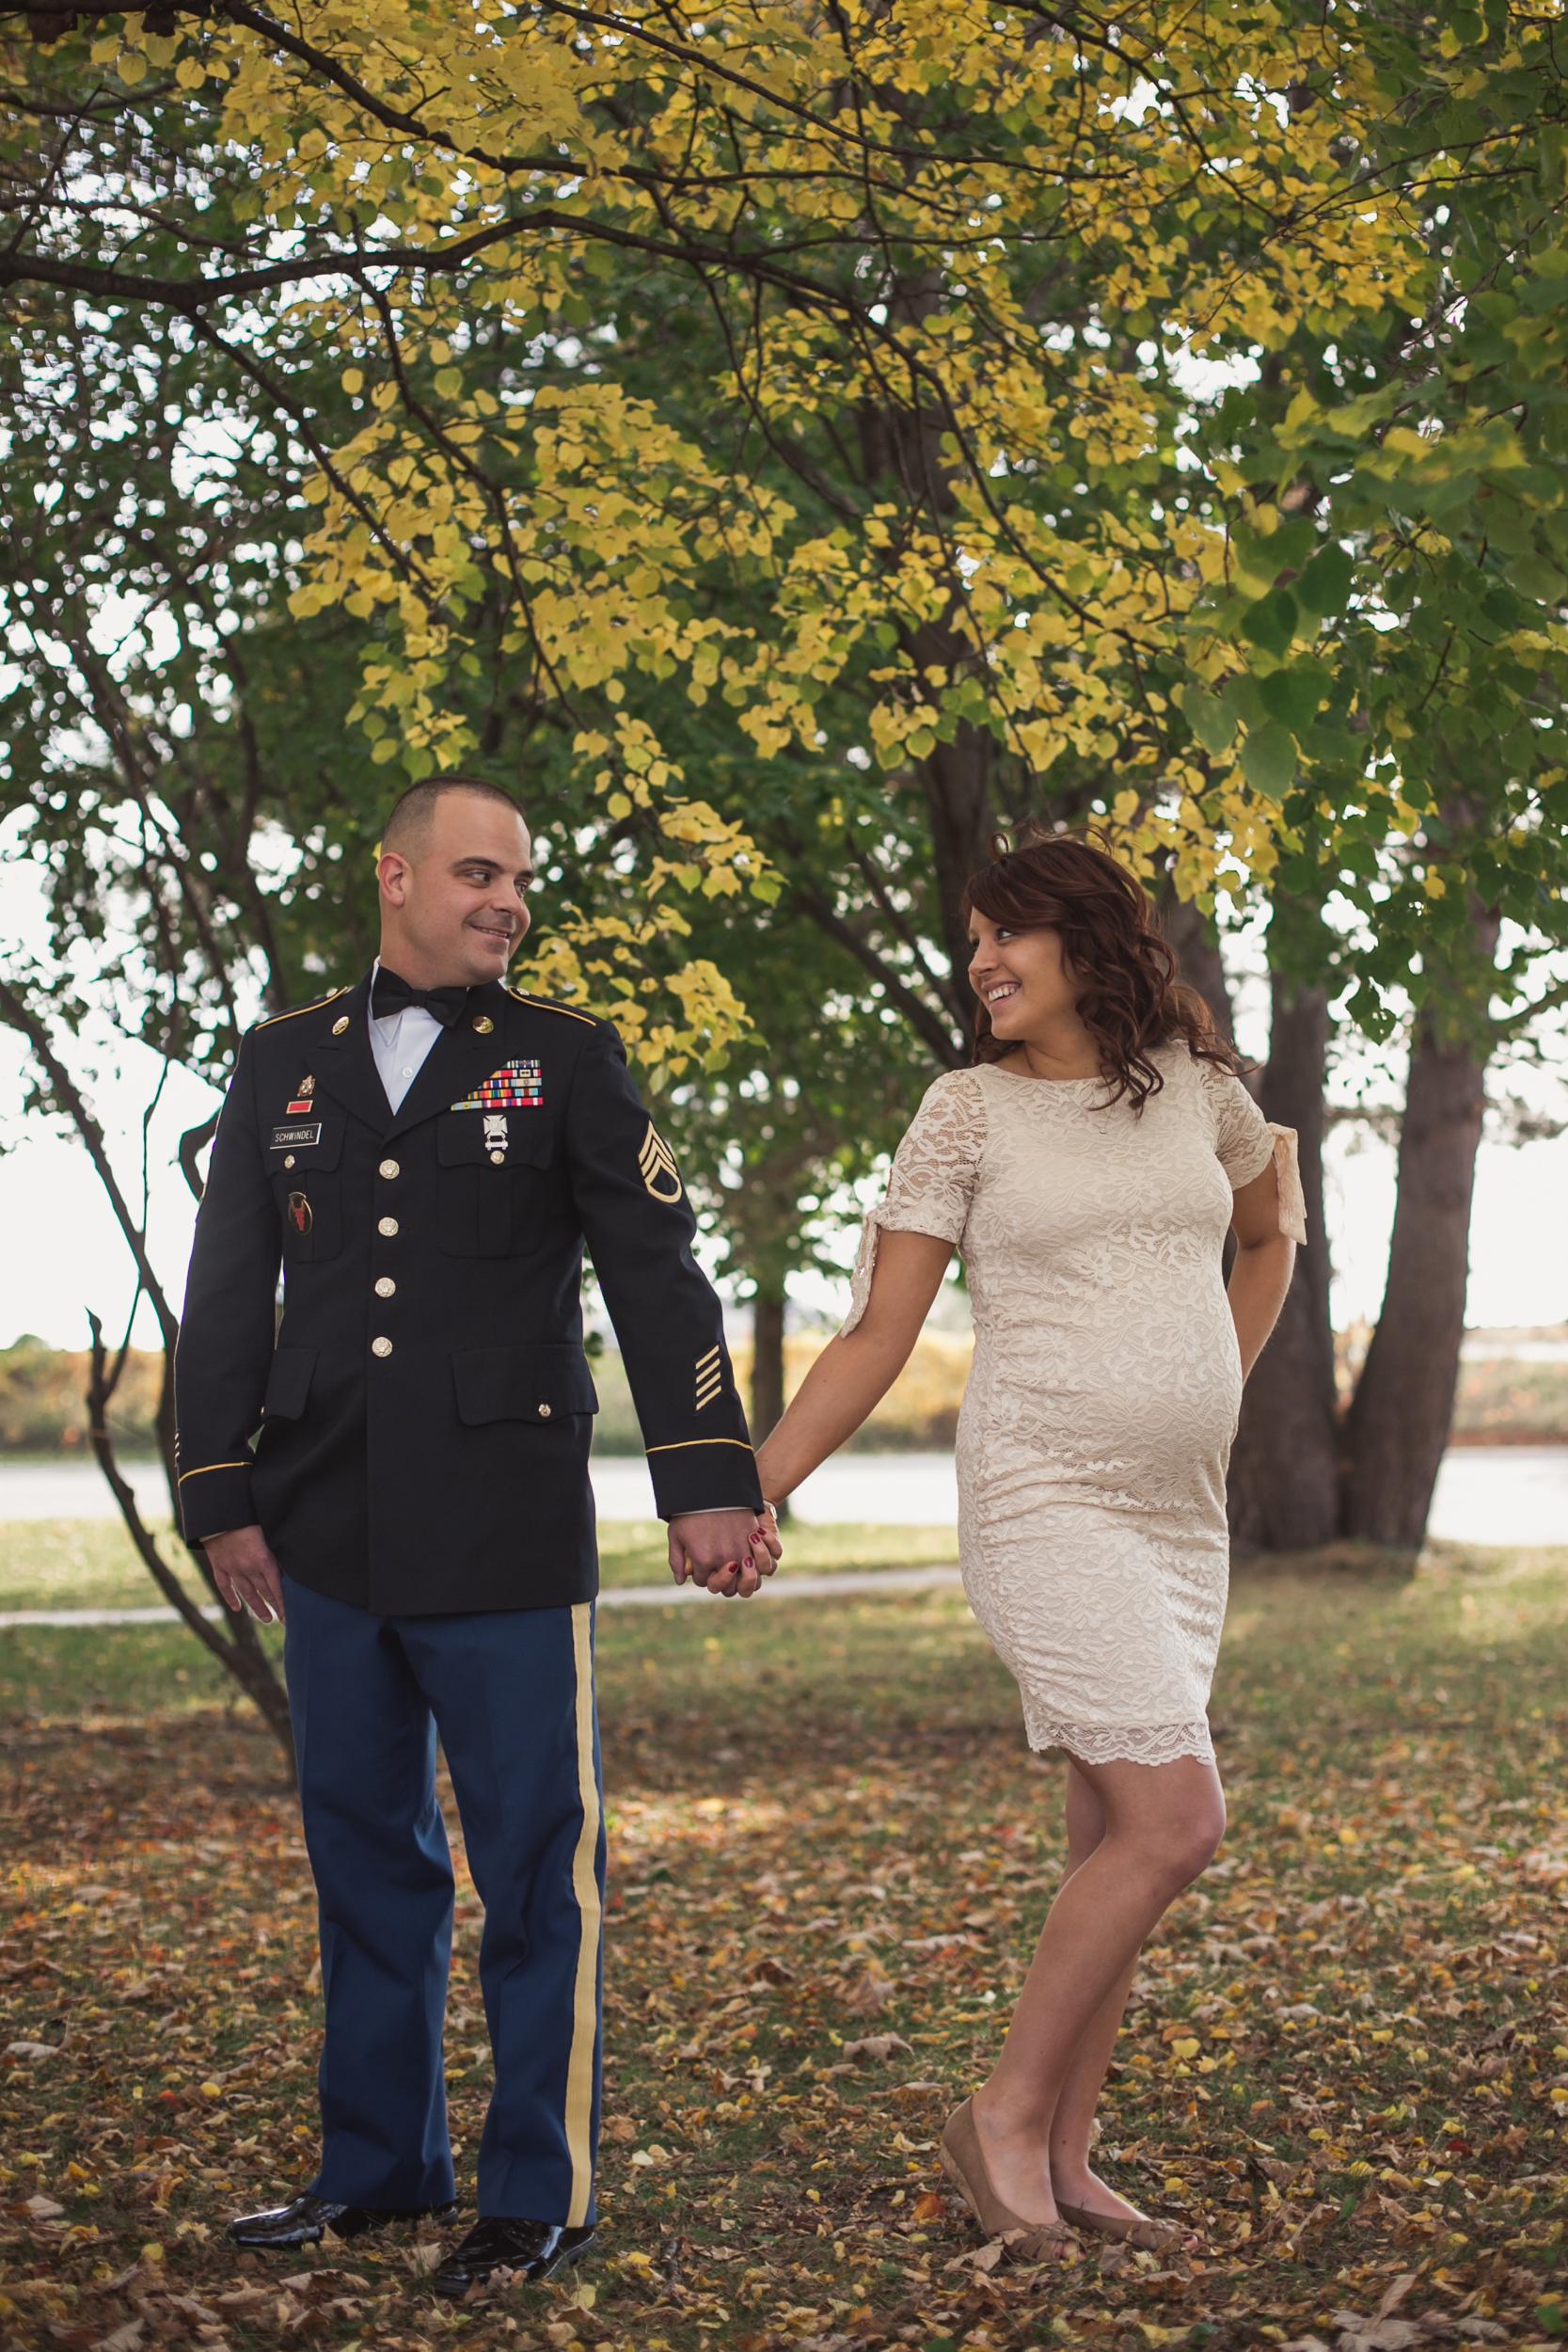 Fort Snelling Elopement St. Paul, MN, Fort Snelling Elopement, Military Elopement, Intimate Military Wedding, intimate elopement wedding-www.rachelsmak.com10.jpg